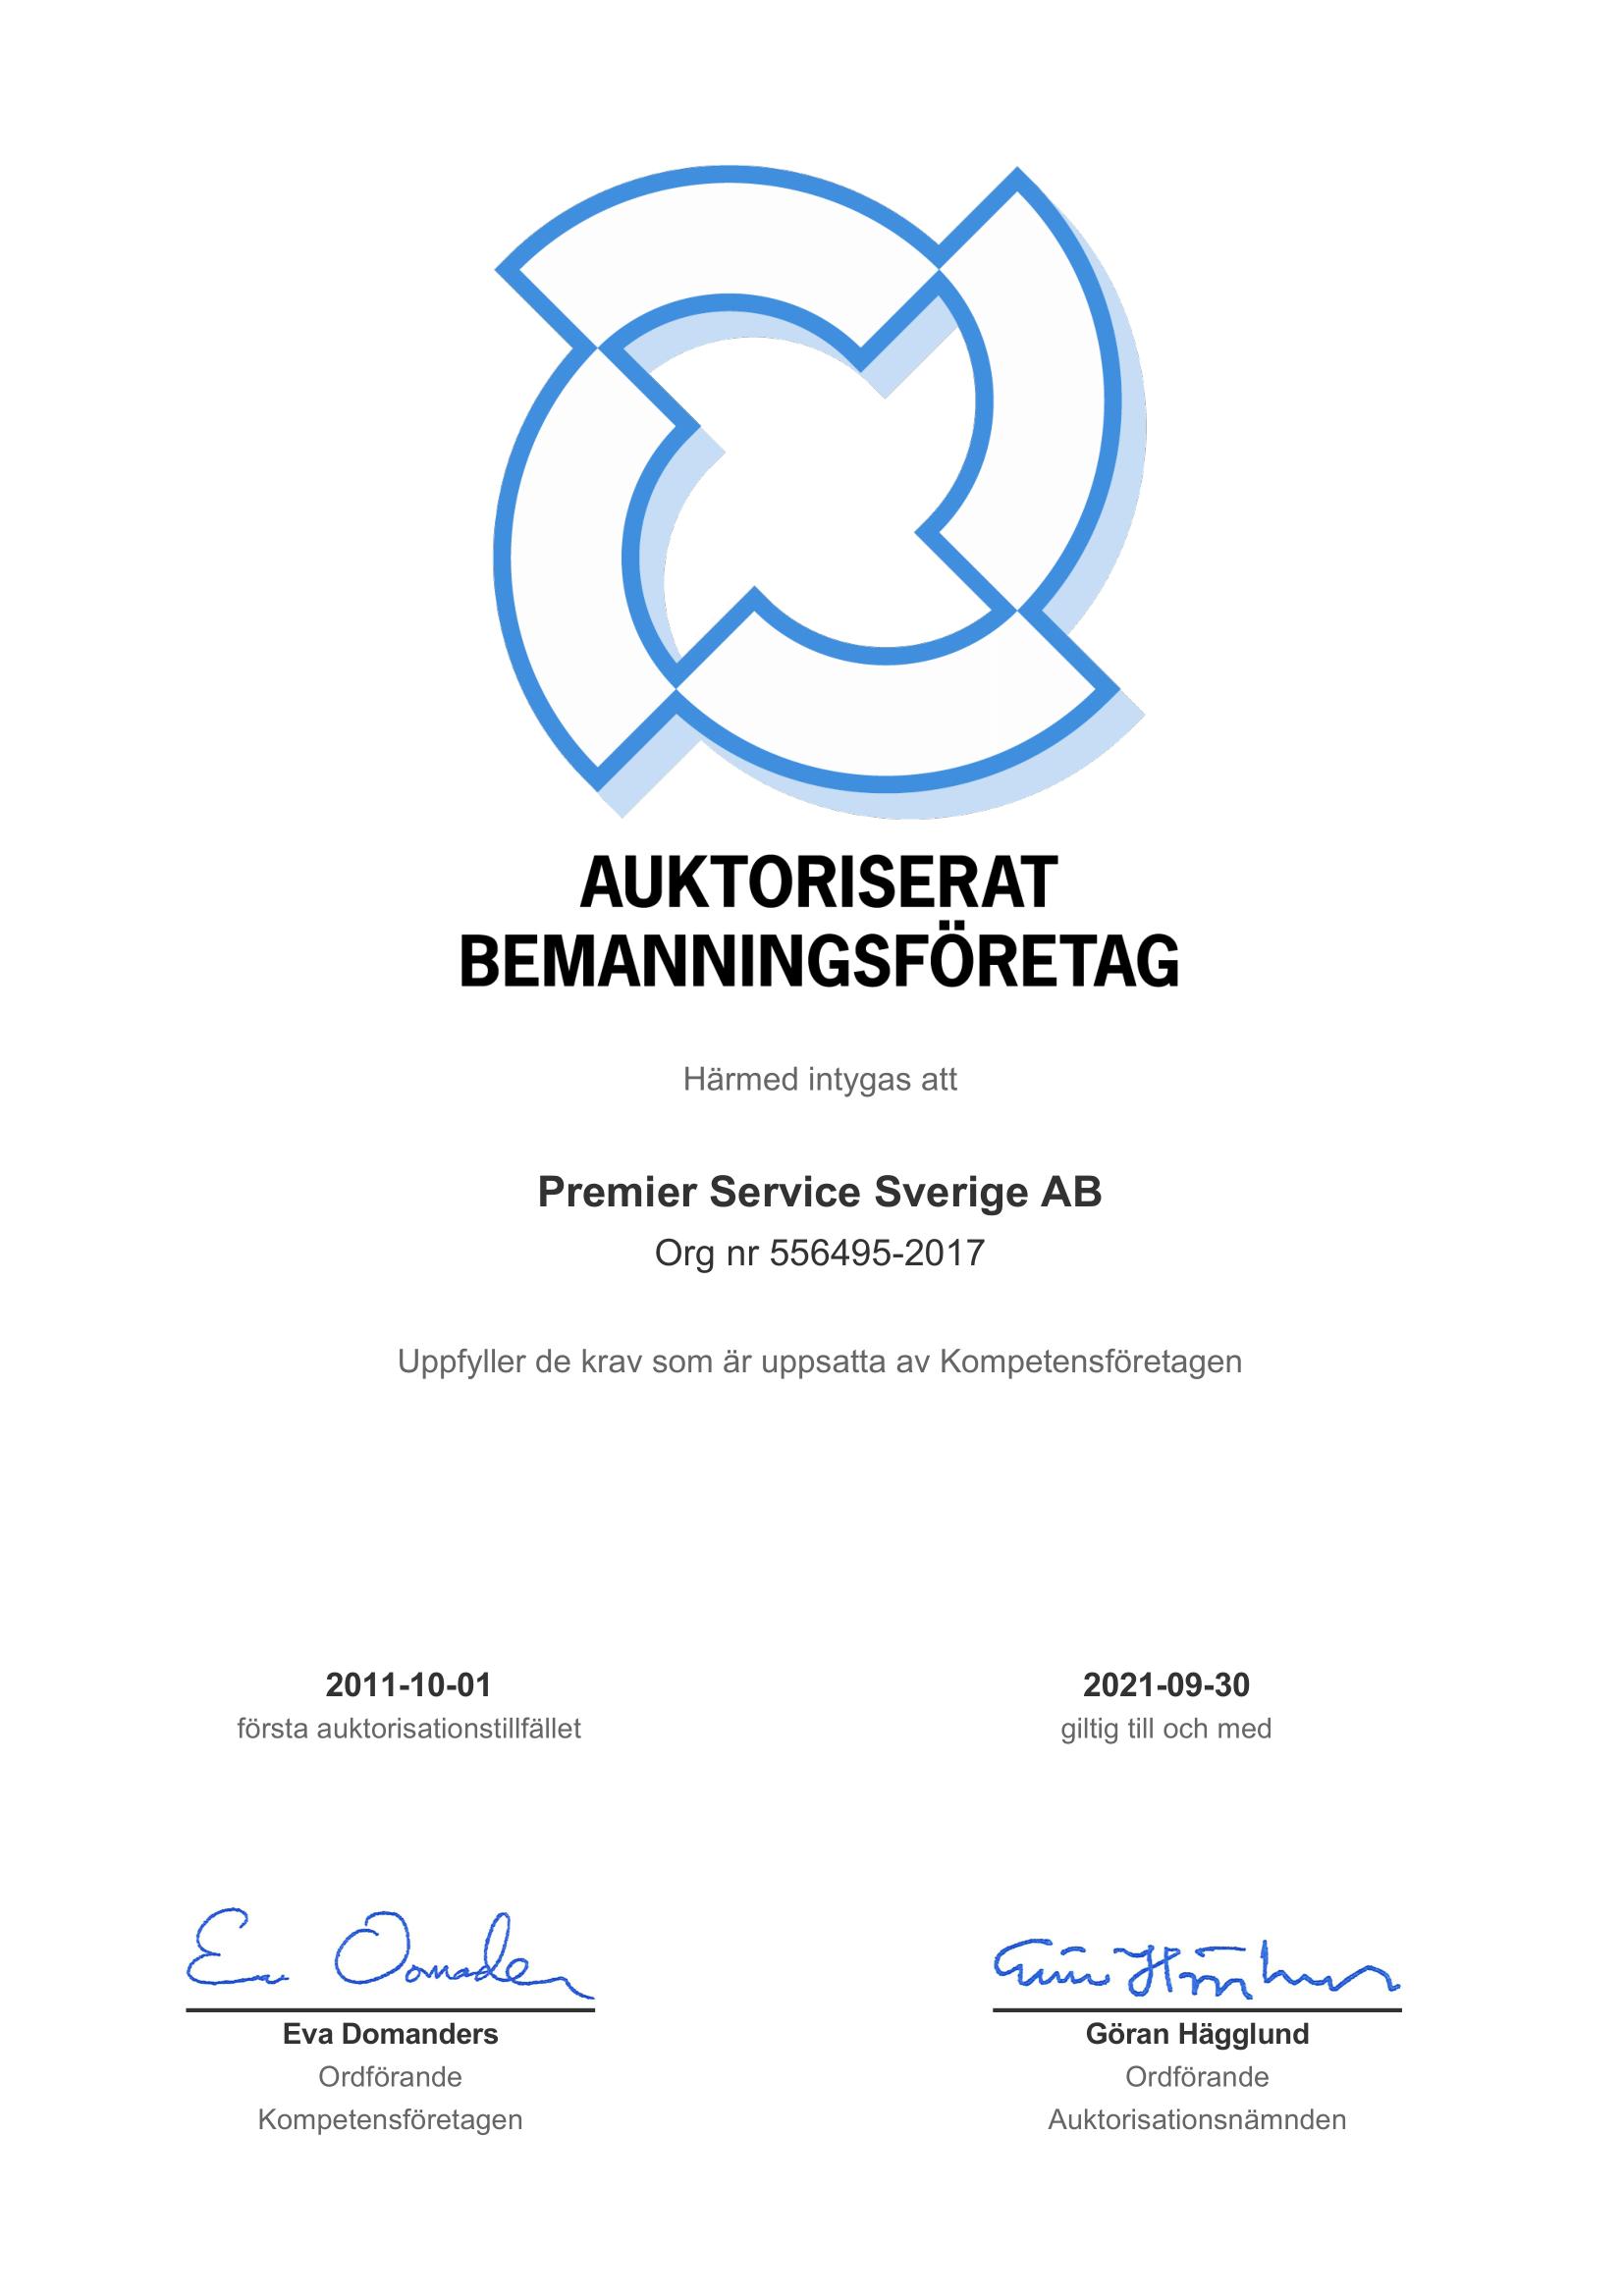 Premiers auktoriserat bemanningsföretag certifikat